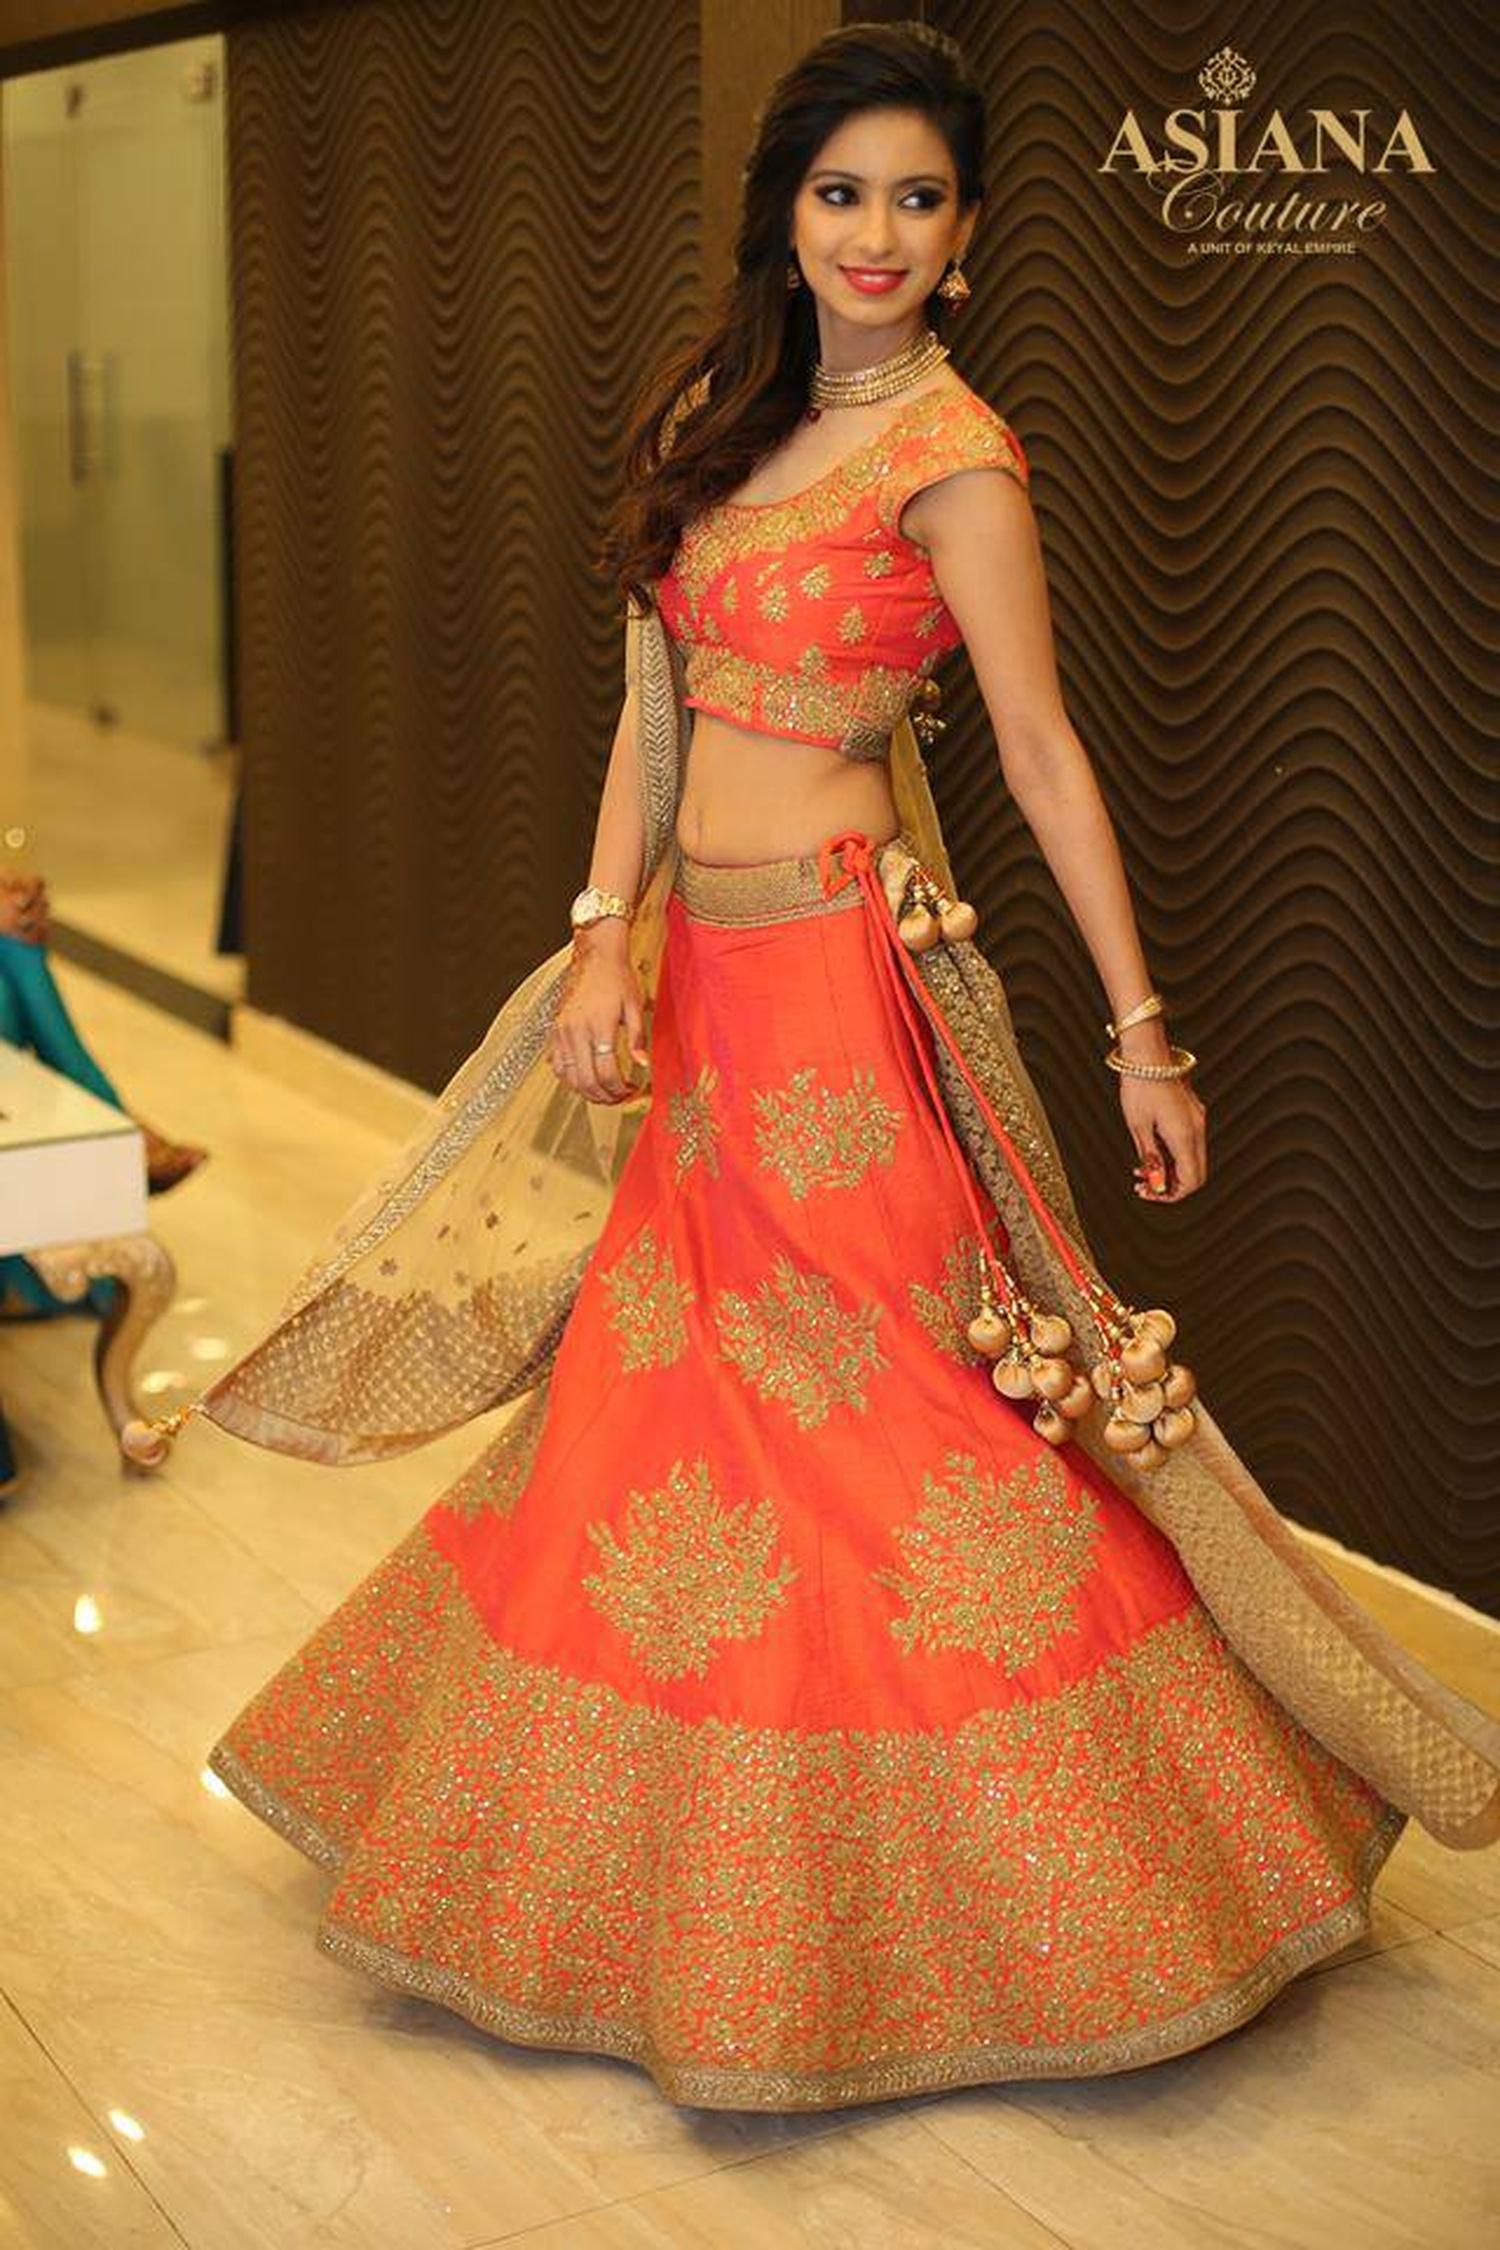 Asiana Couture, Bridal Wear Tailoring in Delhi | WeddingZ